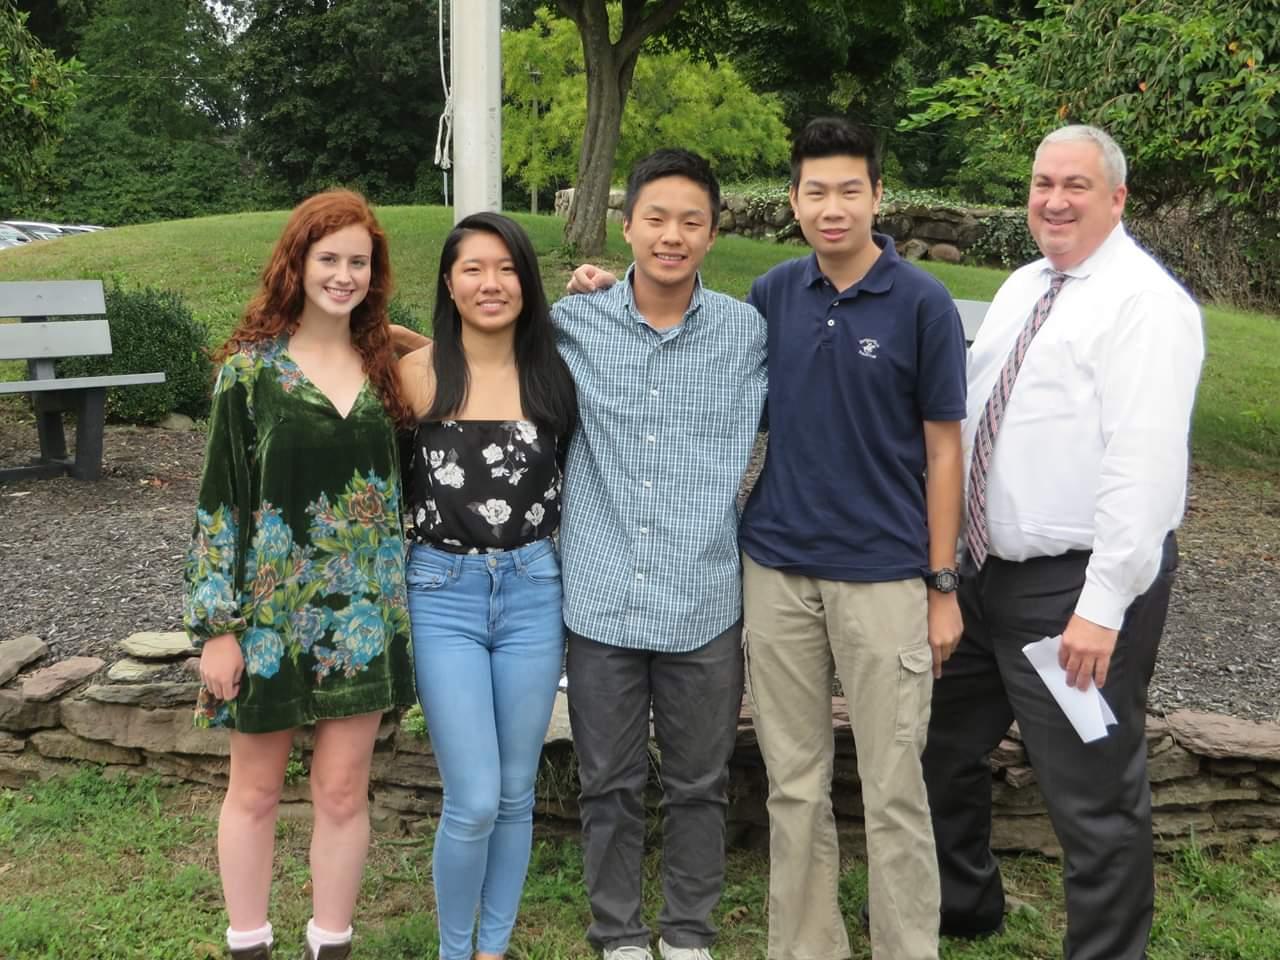 National Merit Scholarship